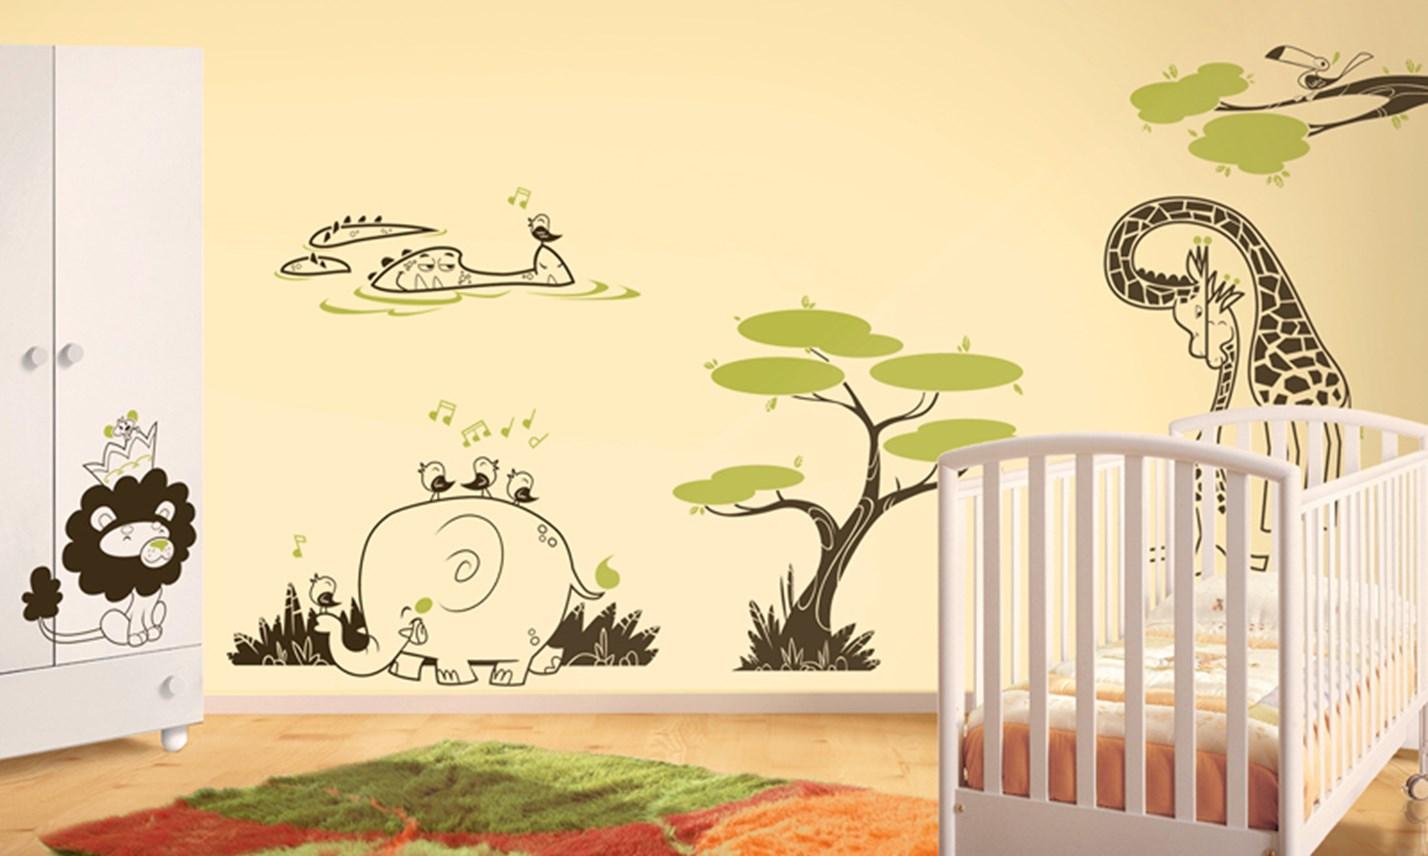 Stickers murali bambini cameretta avventura nella savana leostickers - Adesivi murali per camerette ...